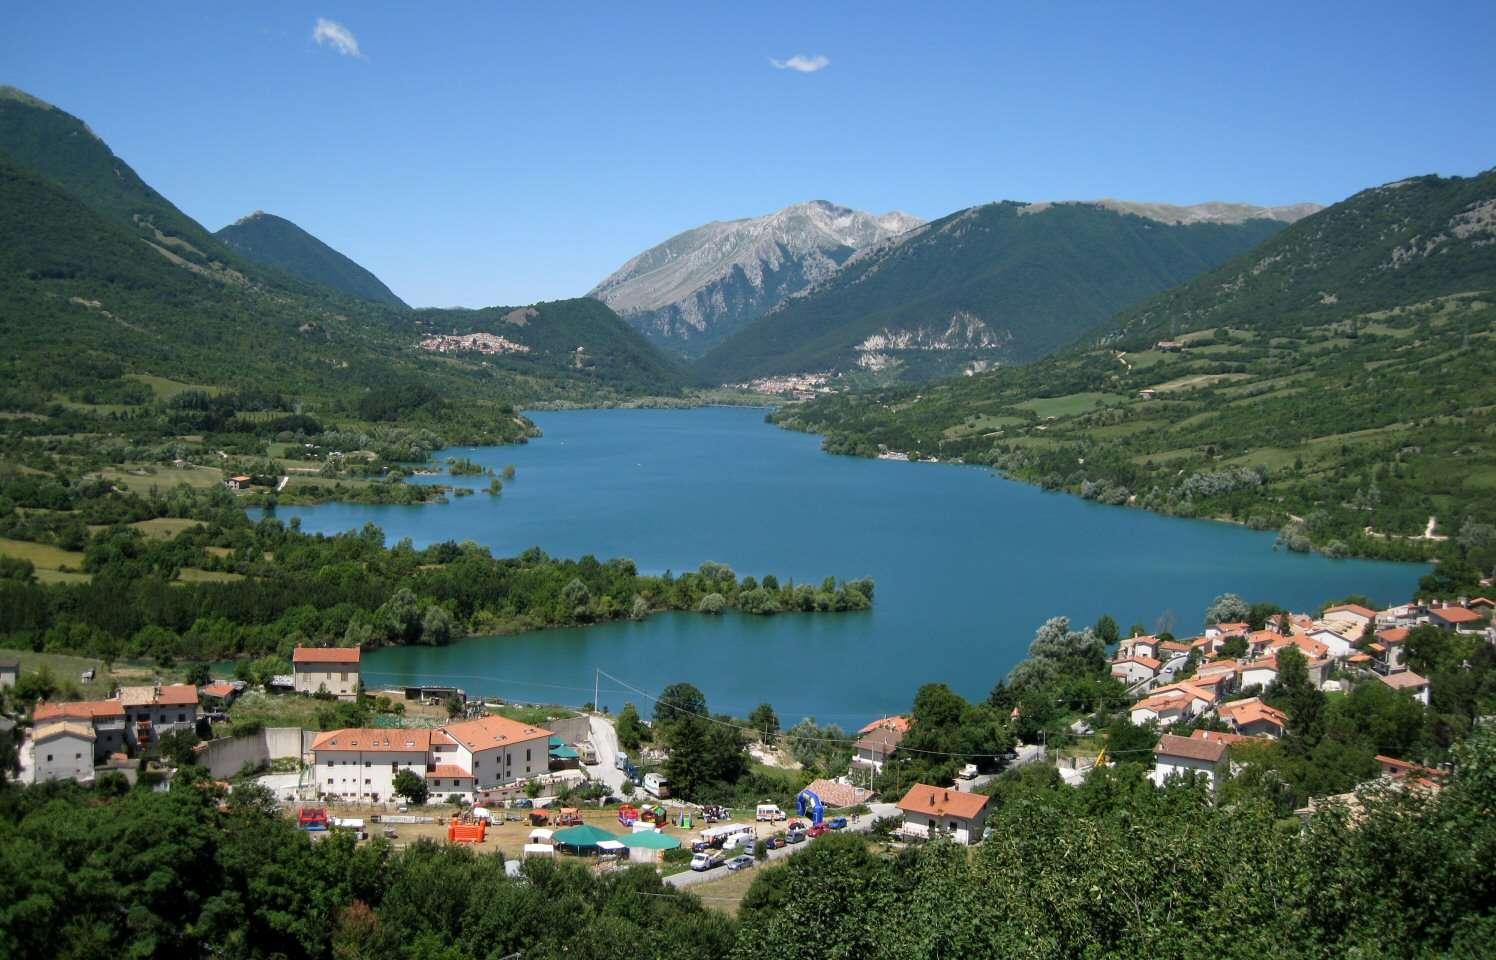 Les villes voisines d'Alfadena Civitella et Villetta Barrea.